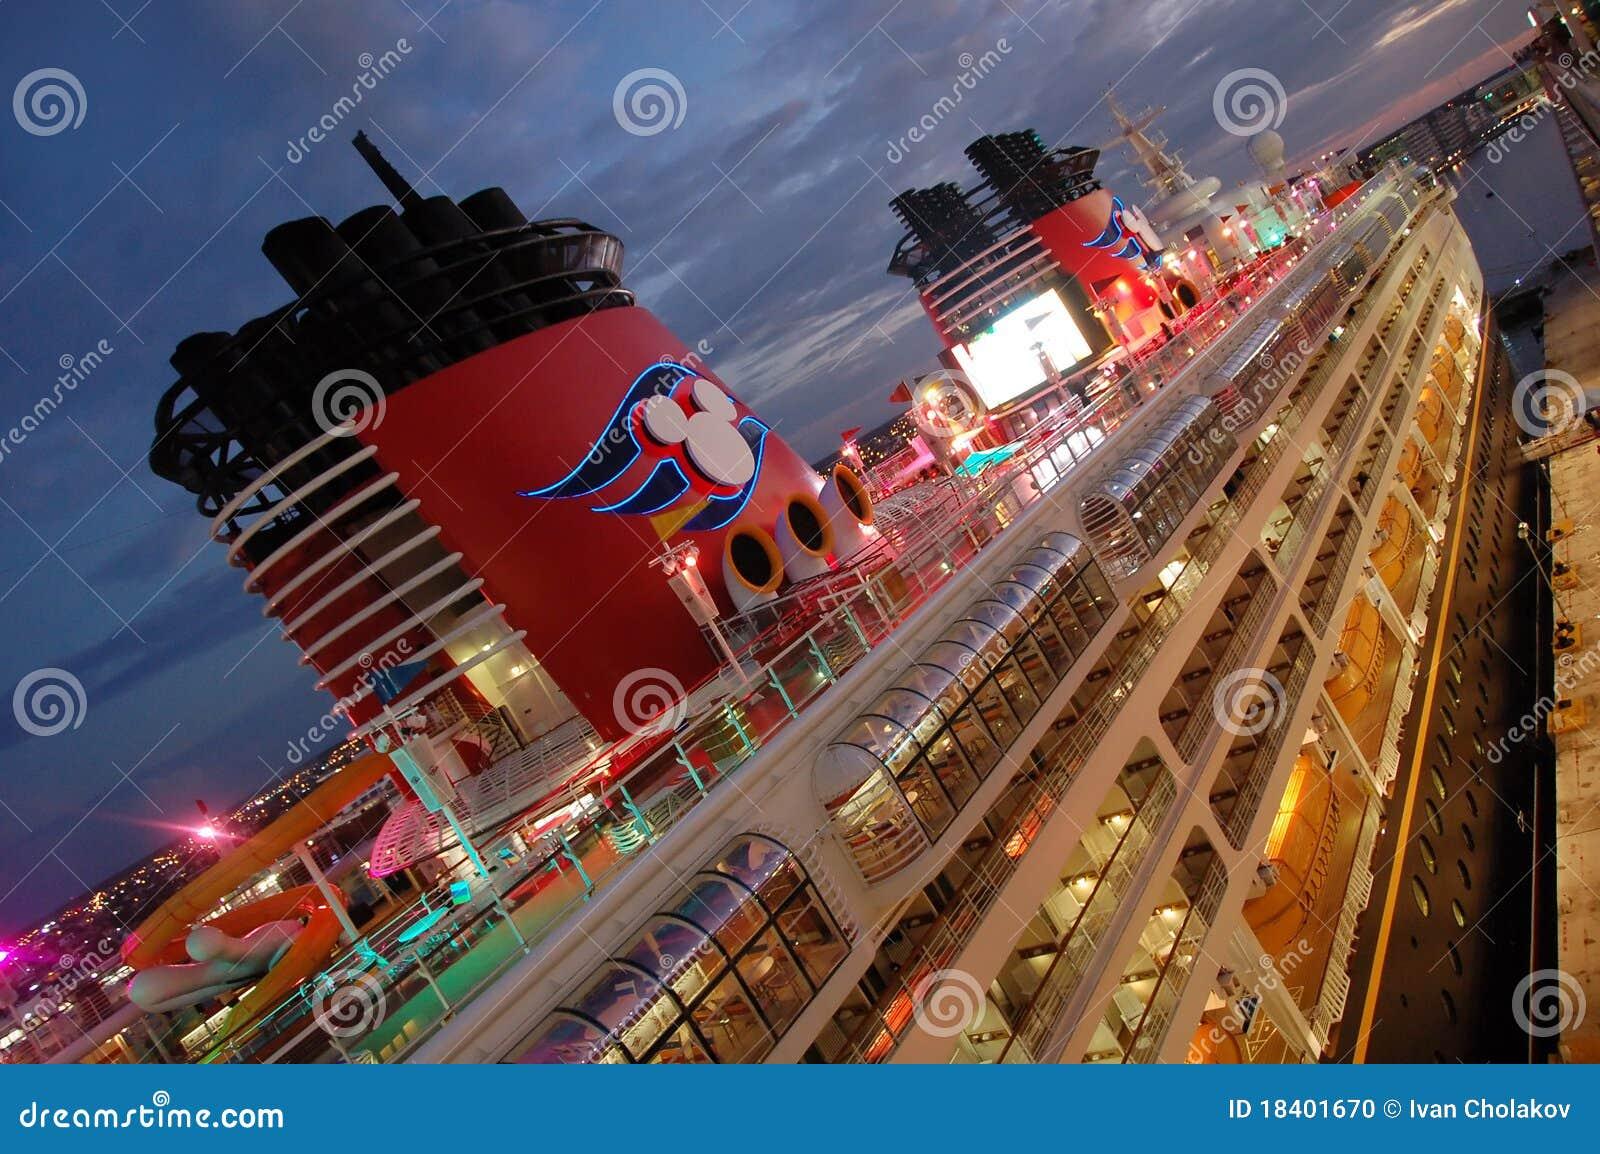 Disney cruise ship at night